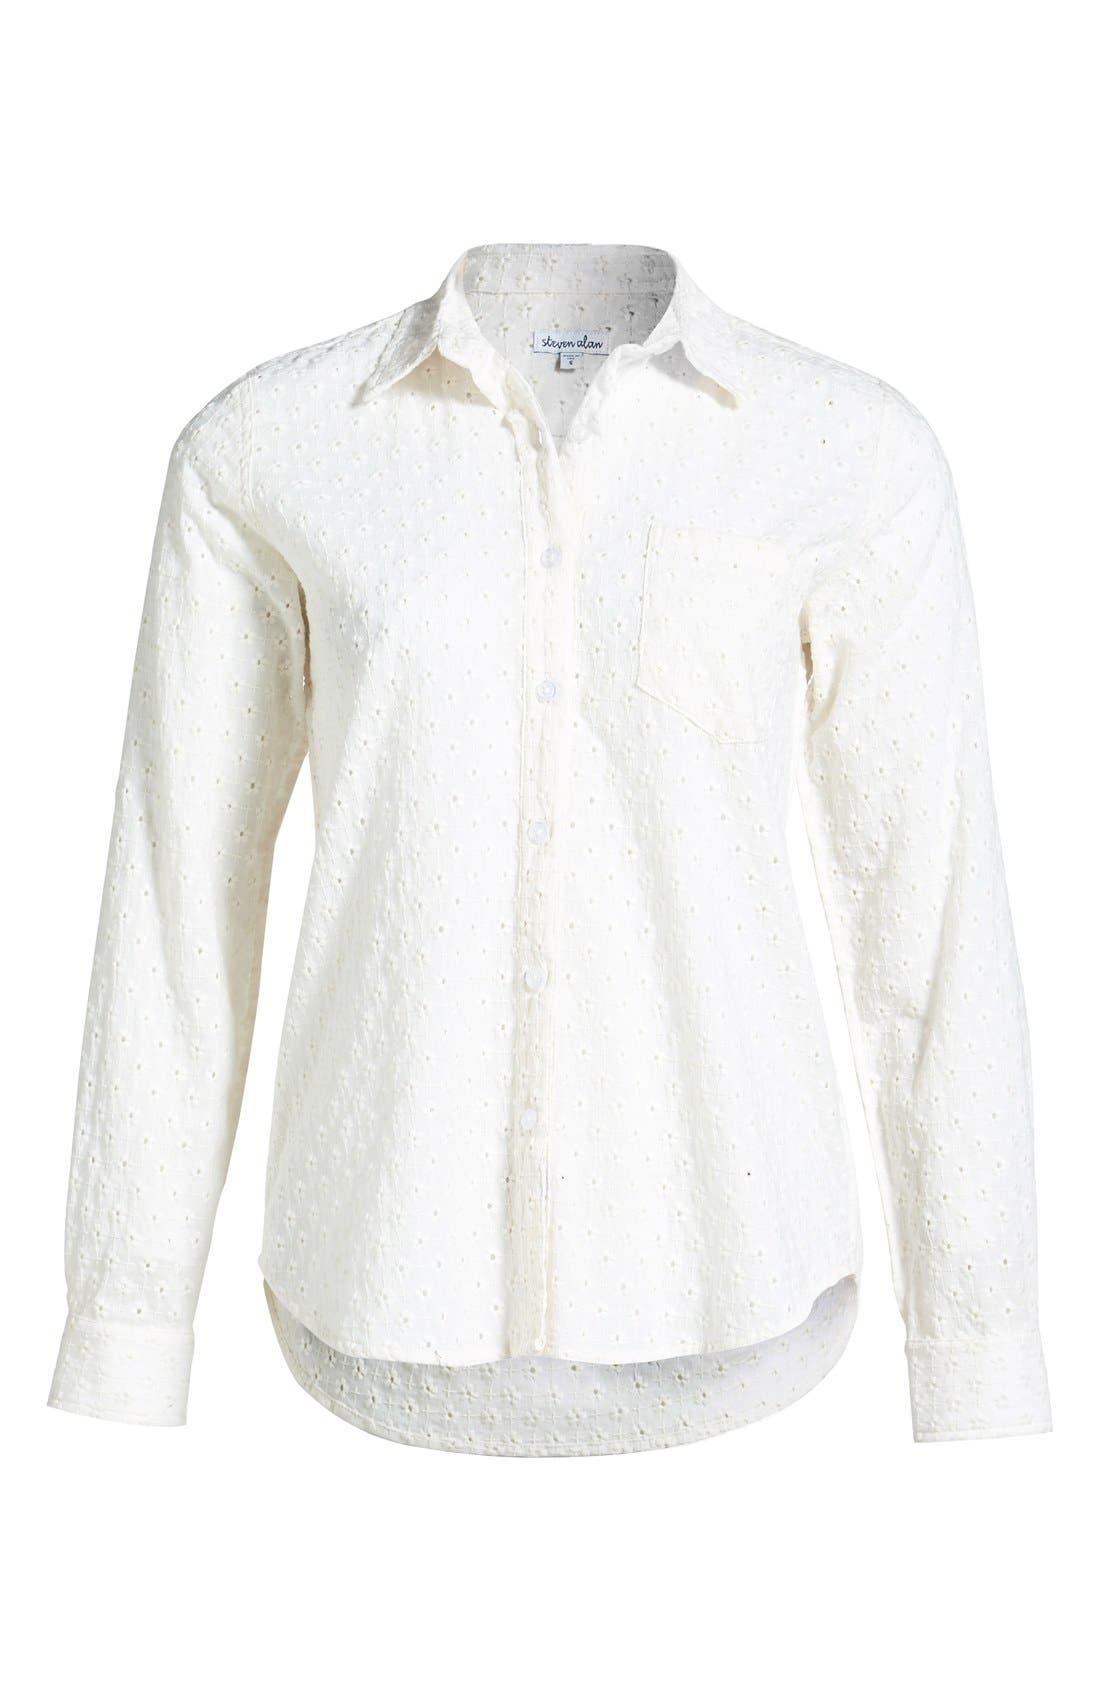 STEVEN ALAN Reverse Seam Shirt, Main, color, 100